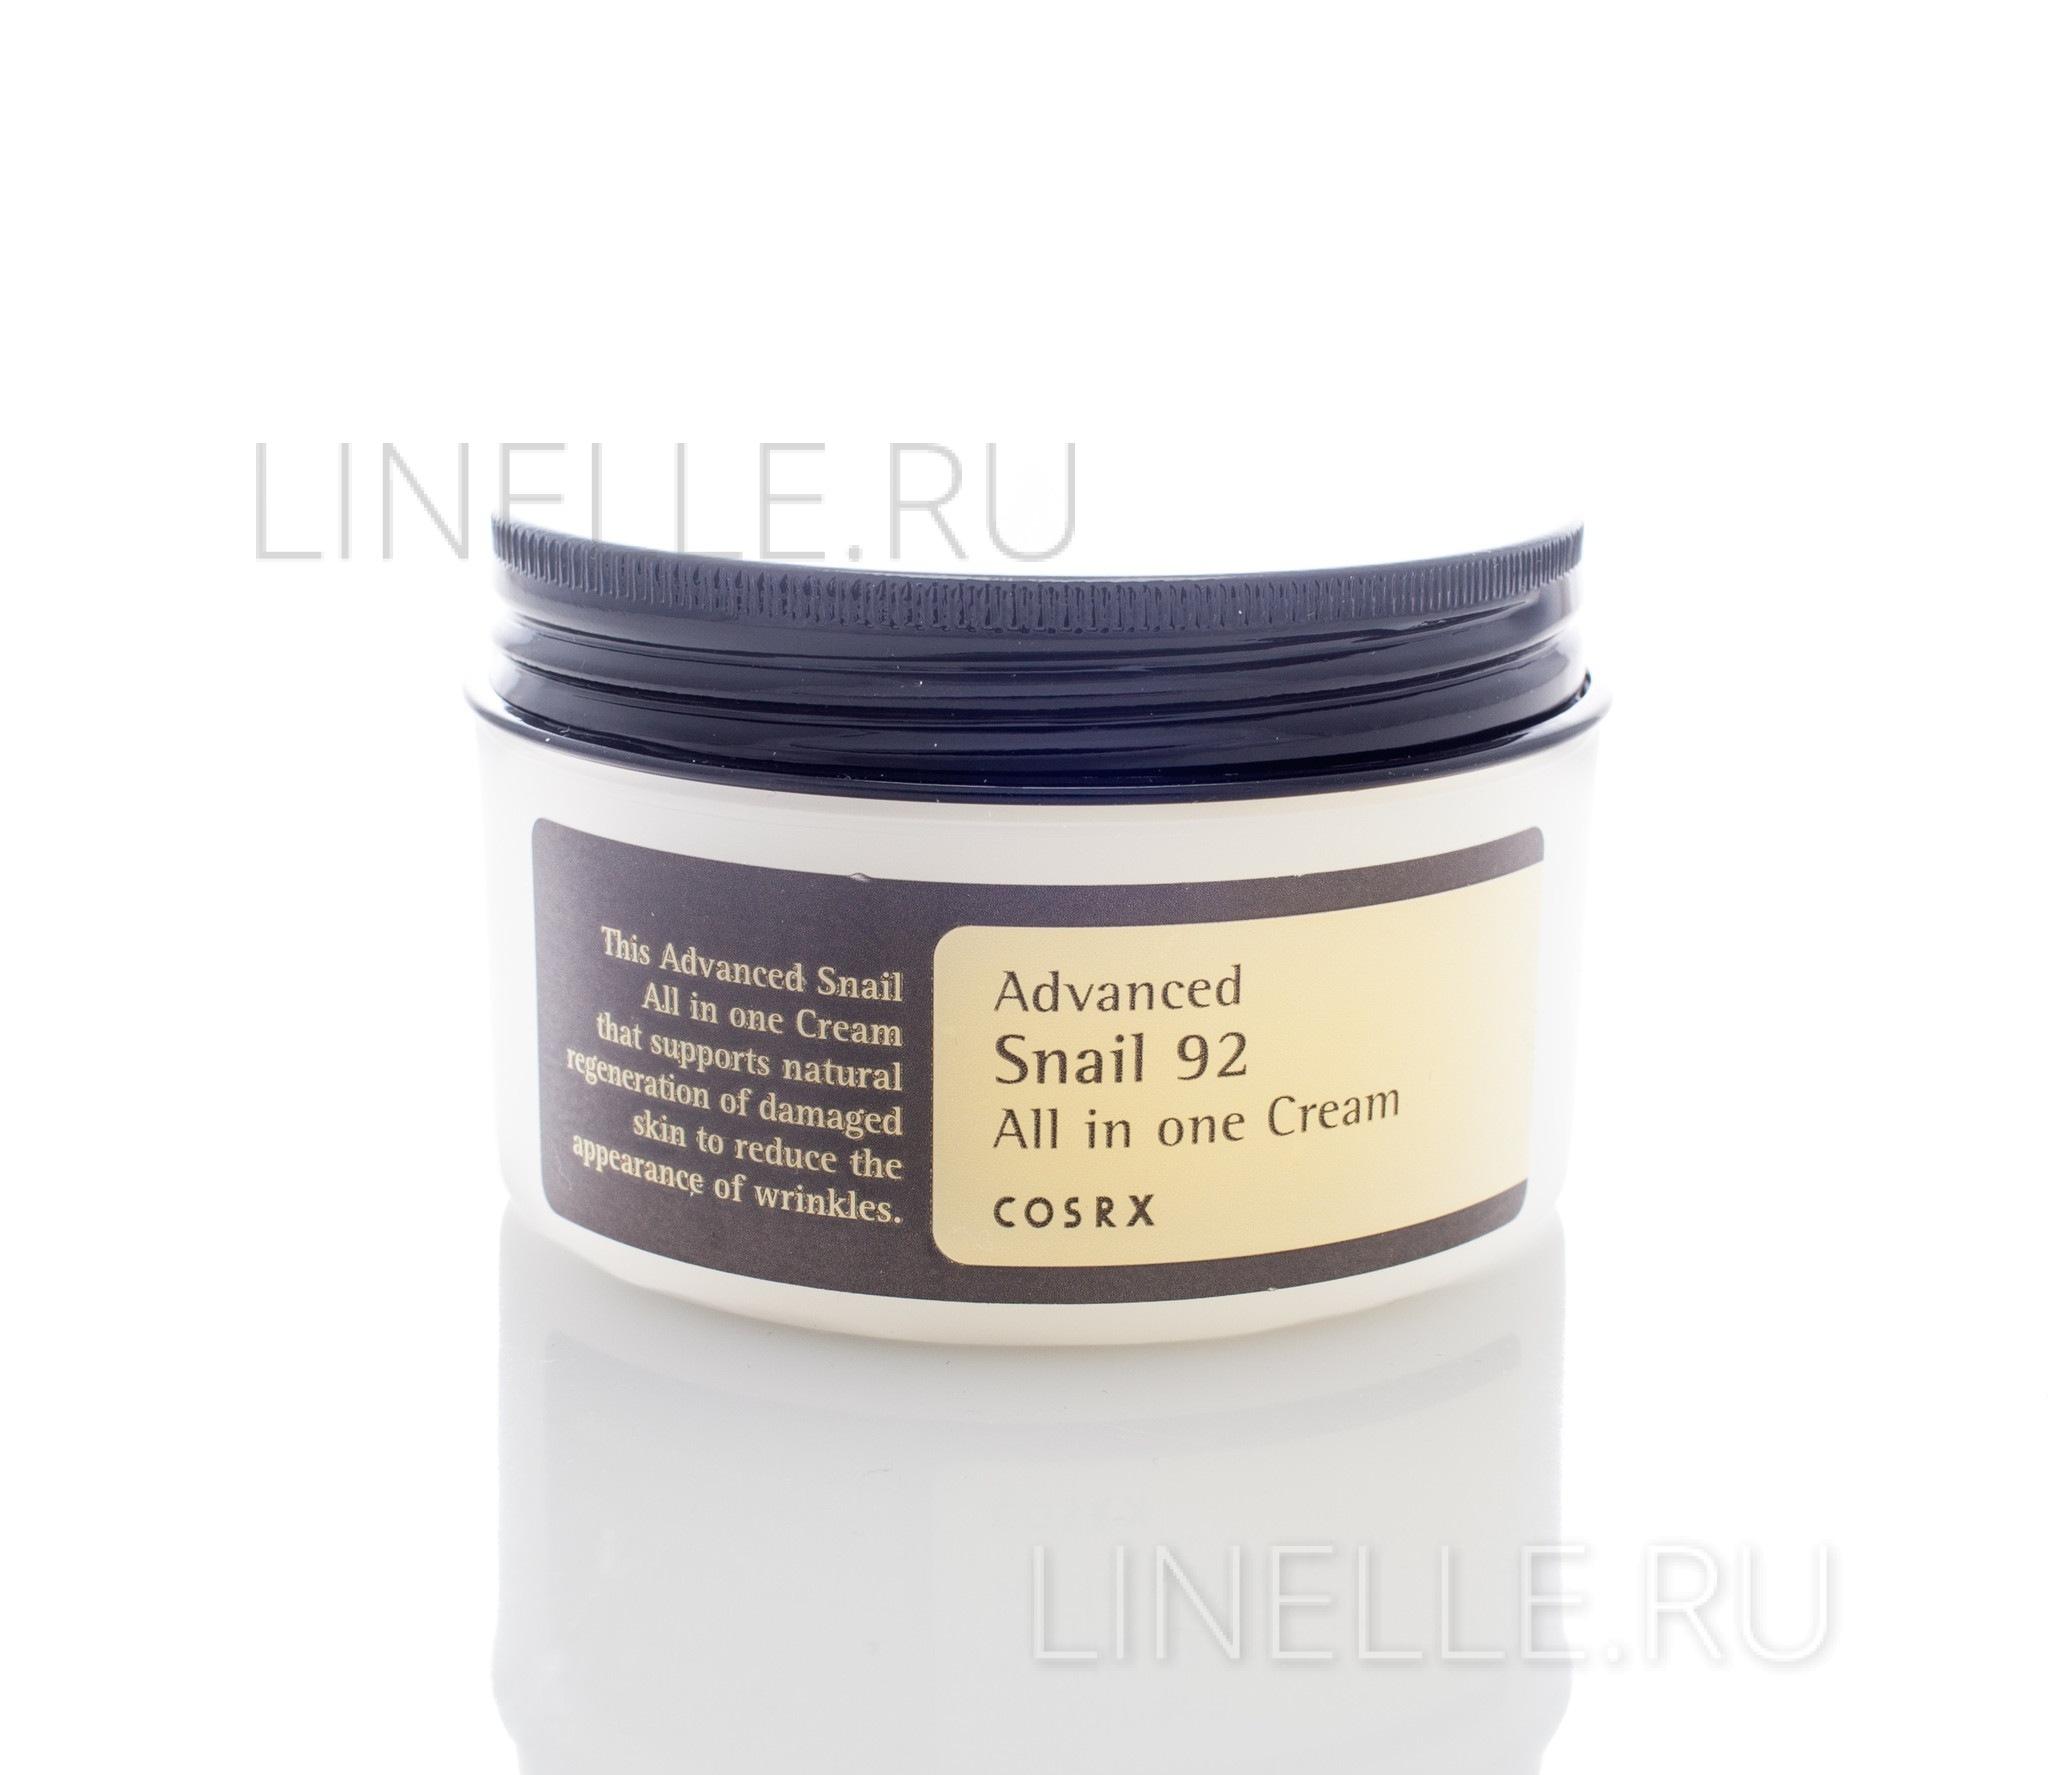 Advanced snail 92 all in one cream [Универсальный крем]